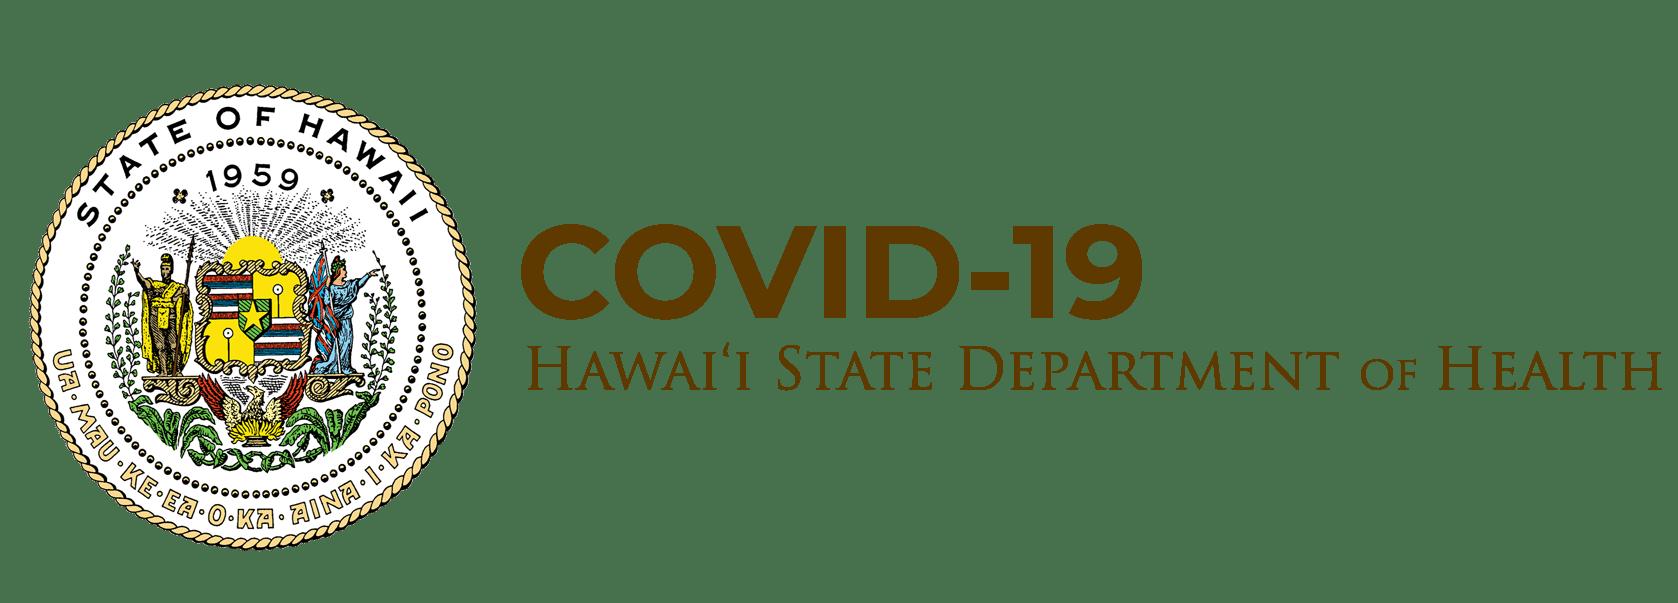 State of Hawaii COVID-19